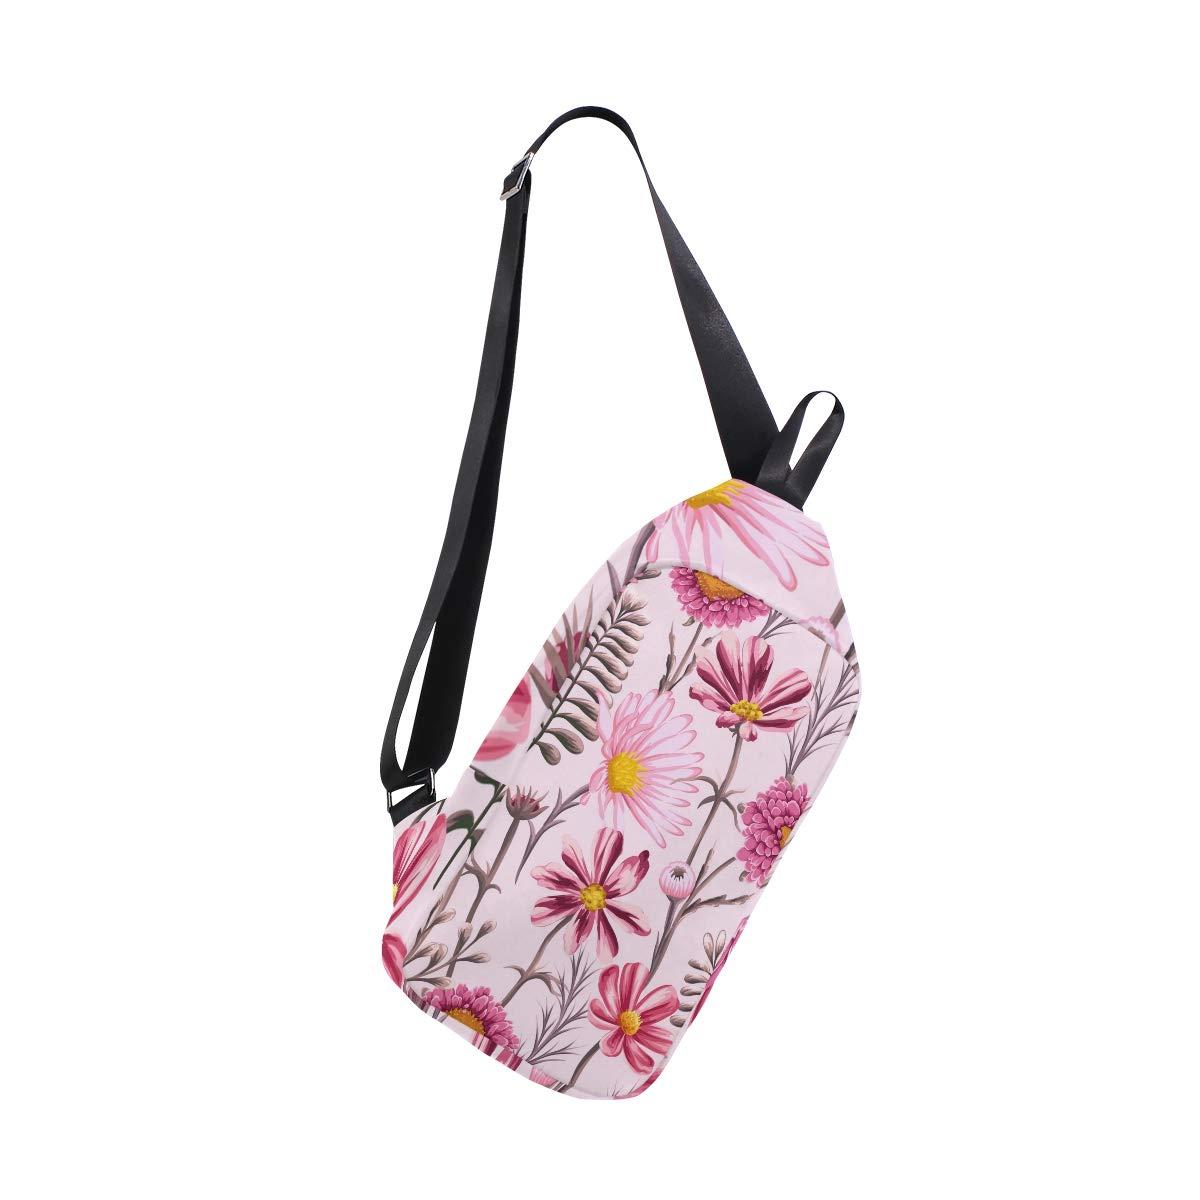 AHOMY Watercolor Flowers Tropical Messenger Bag Small Travel School Sling Bag Crossbody Bag